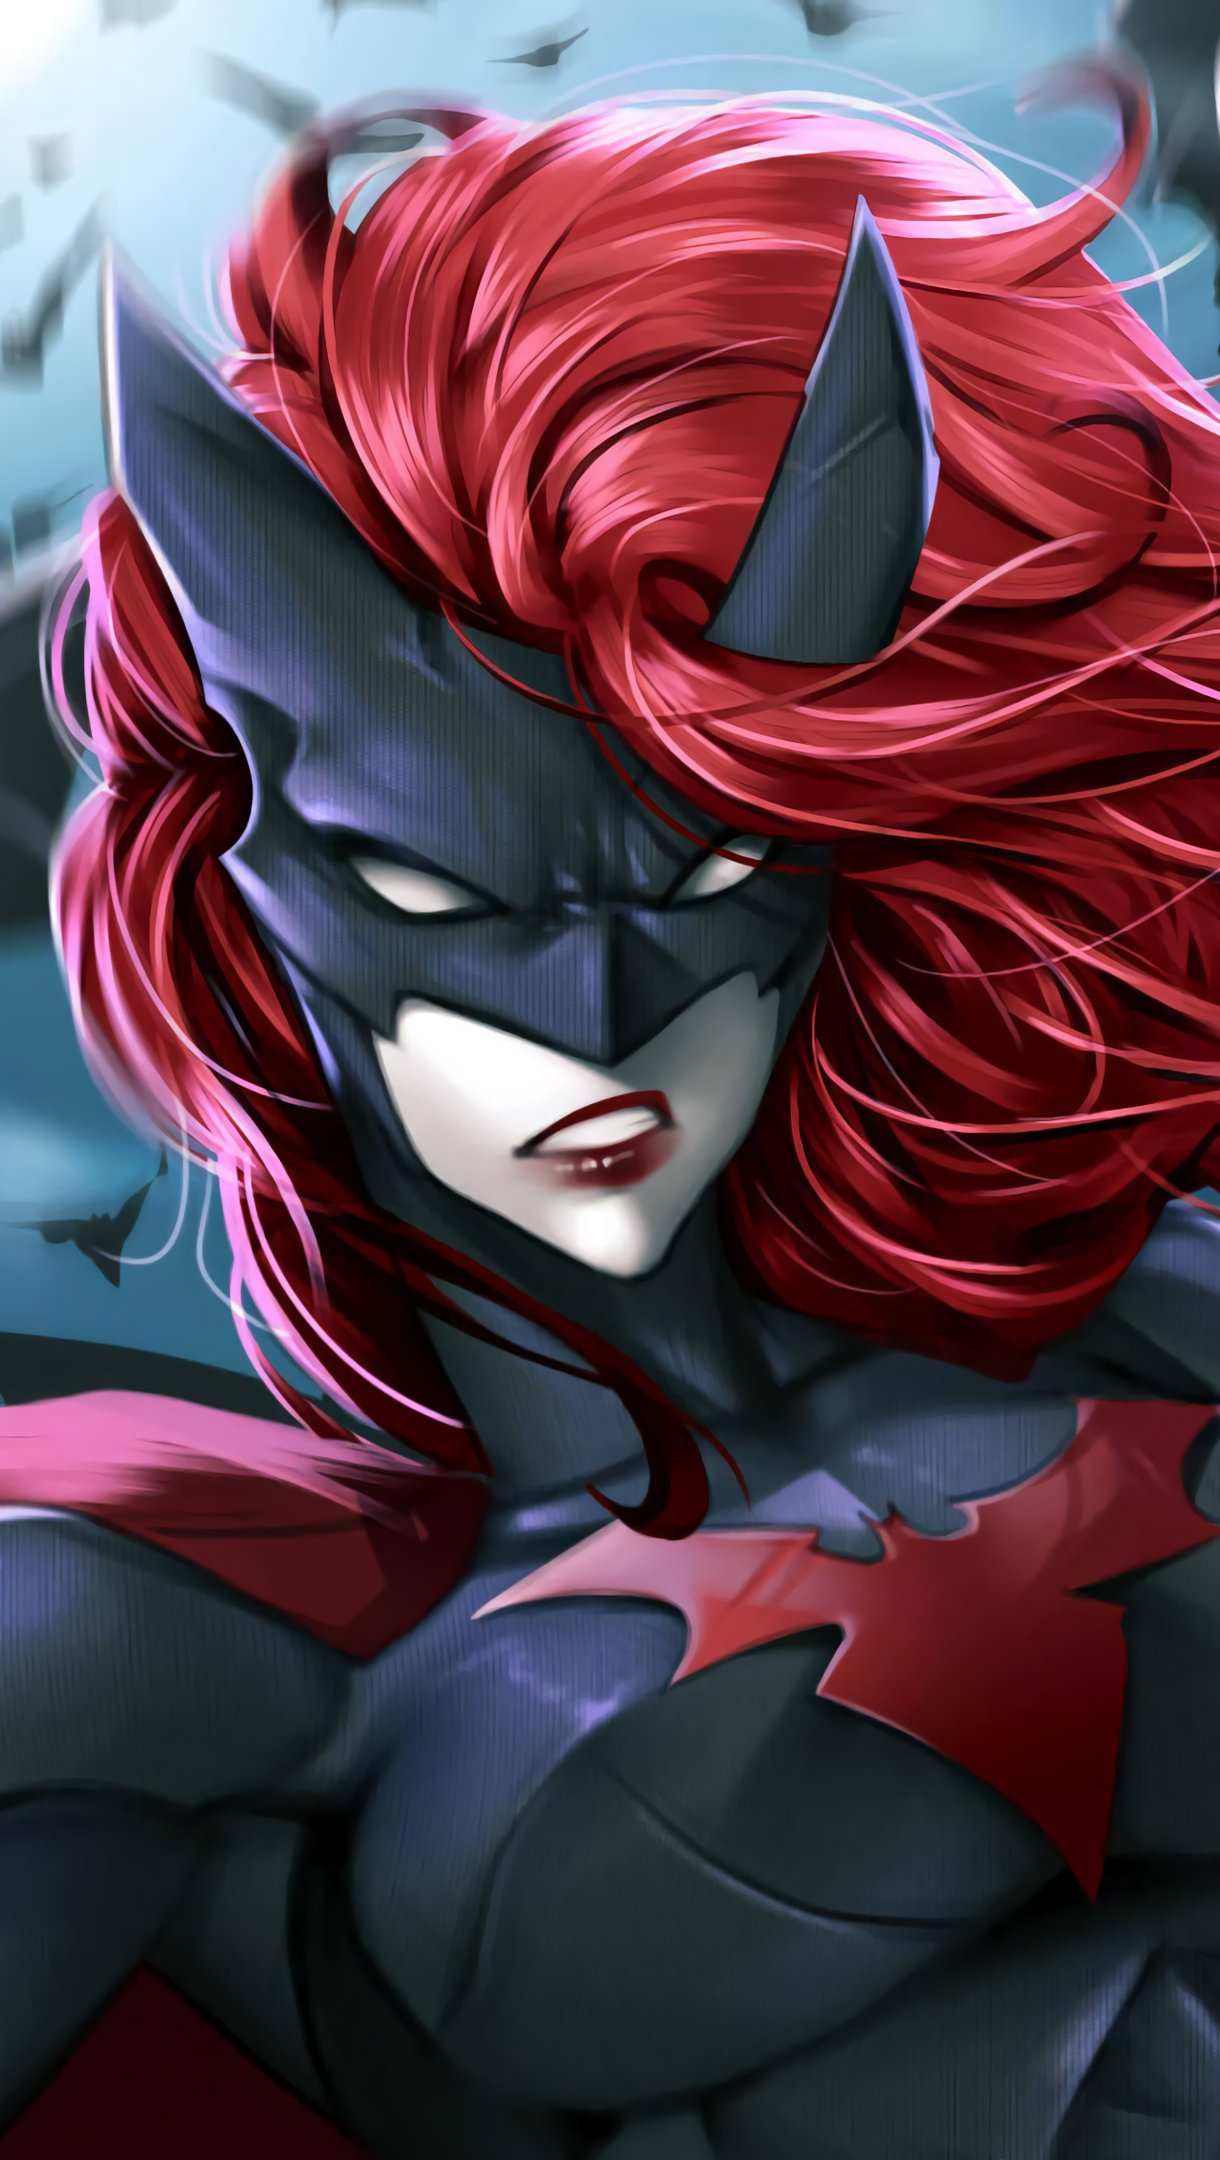 Fondos de pantalla Batwoman Vertical